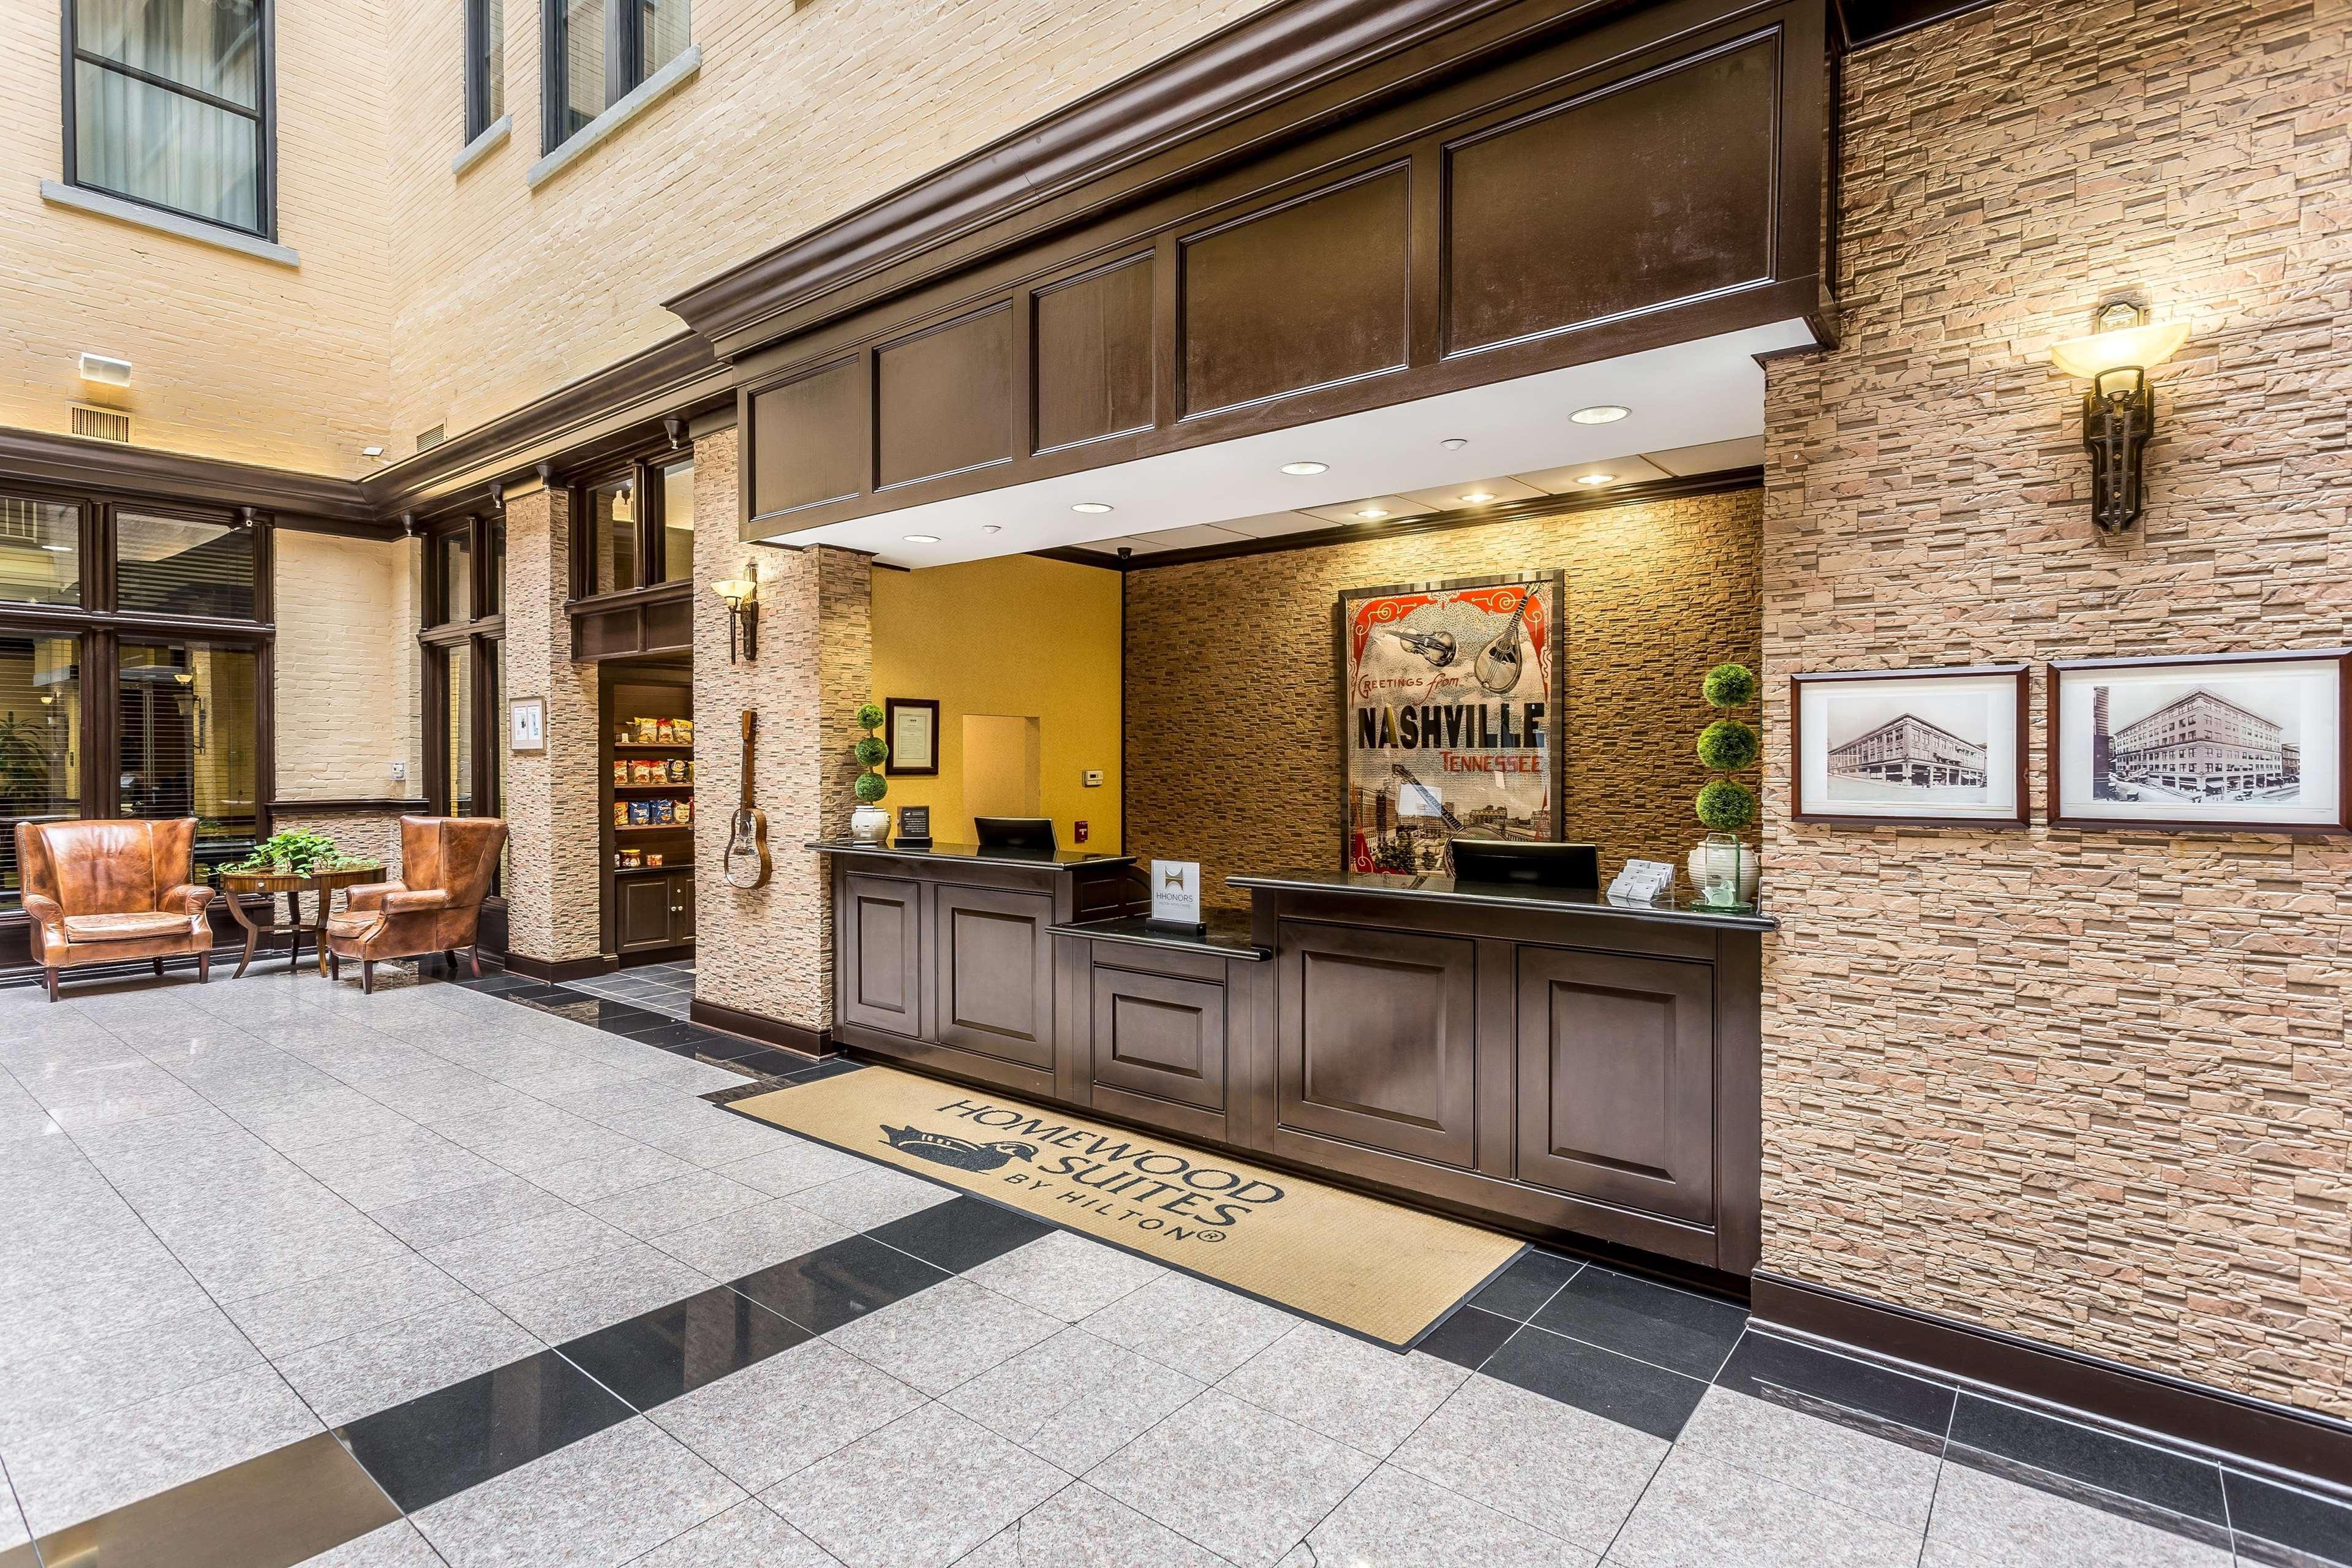 Homewood Suites by Hilton Nashville-Downtown image 1